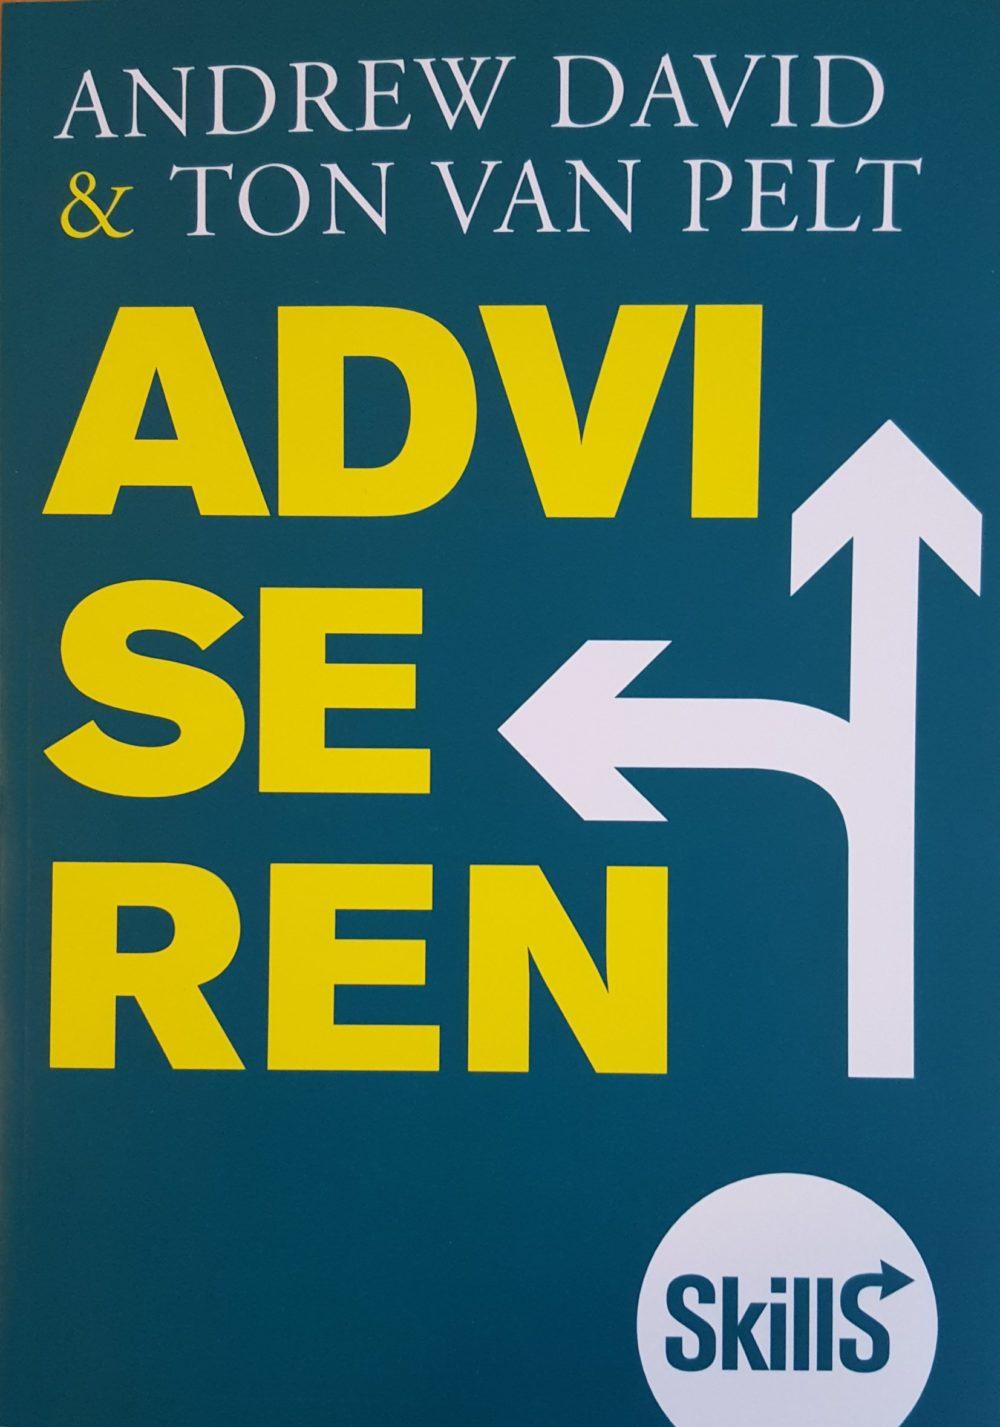 H4 Skills adviseren Andrew David & Ton van Pelt Pearson 4e druk